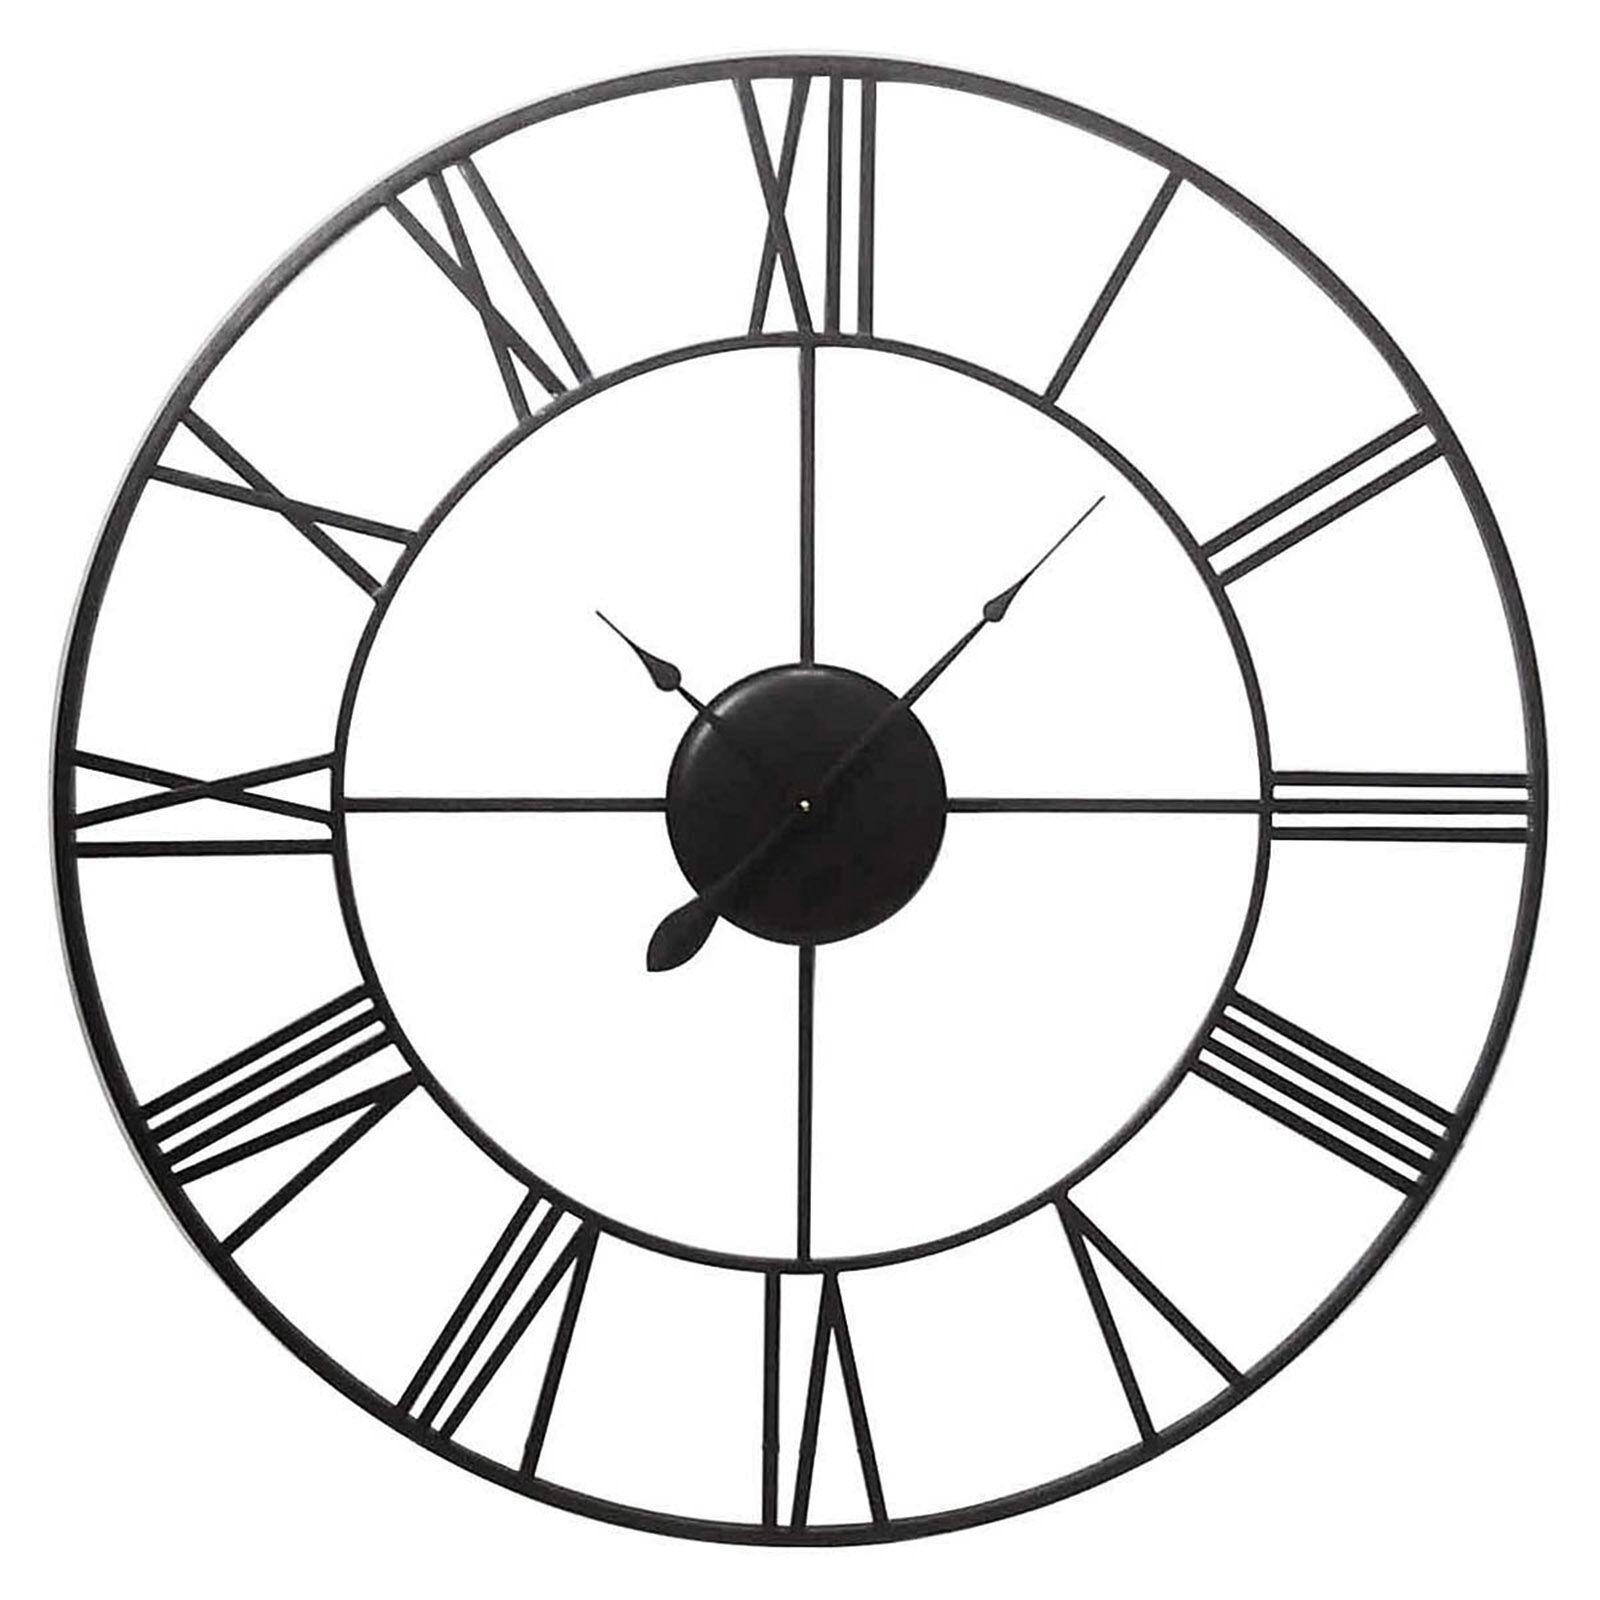 Garage Giant Metal Clock Roman Numerals At Home Roman Numerals Clock Tattoo Ideas Roman Numerals Clock Tattoo Roman Numerals Giant Metal Clock houzz-03 Roman Numerals Clock